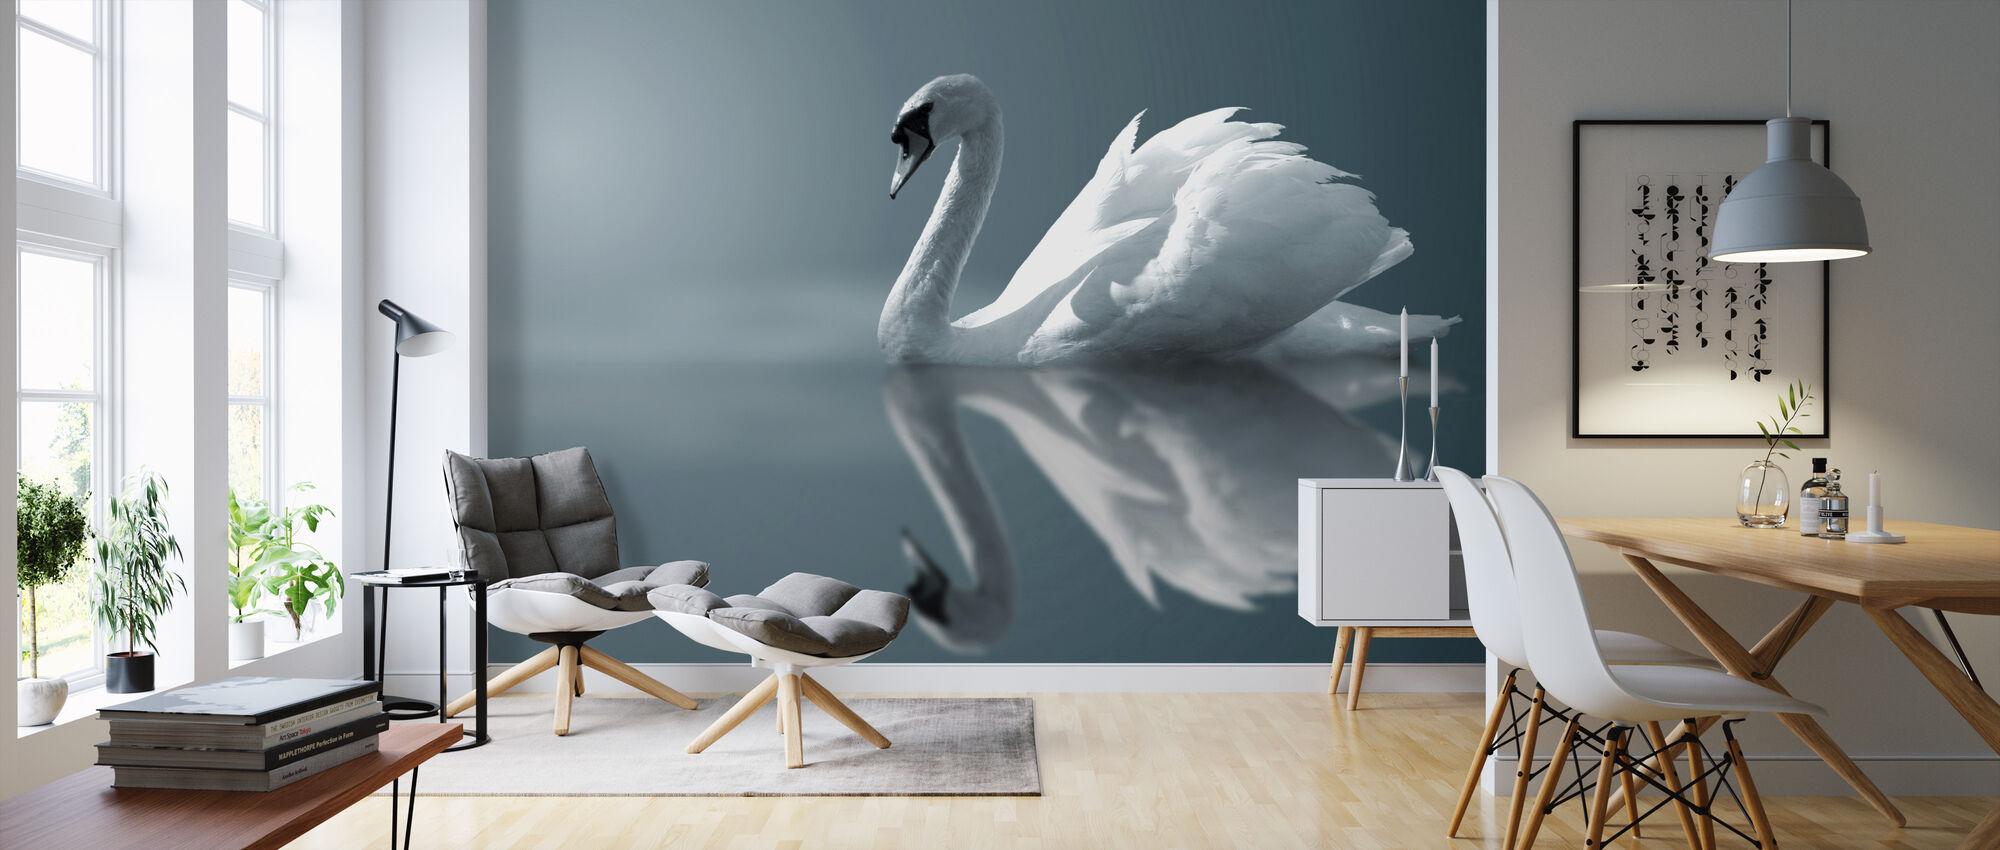 Swan Reflection - Wallpaper - Living Room